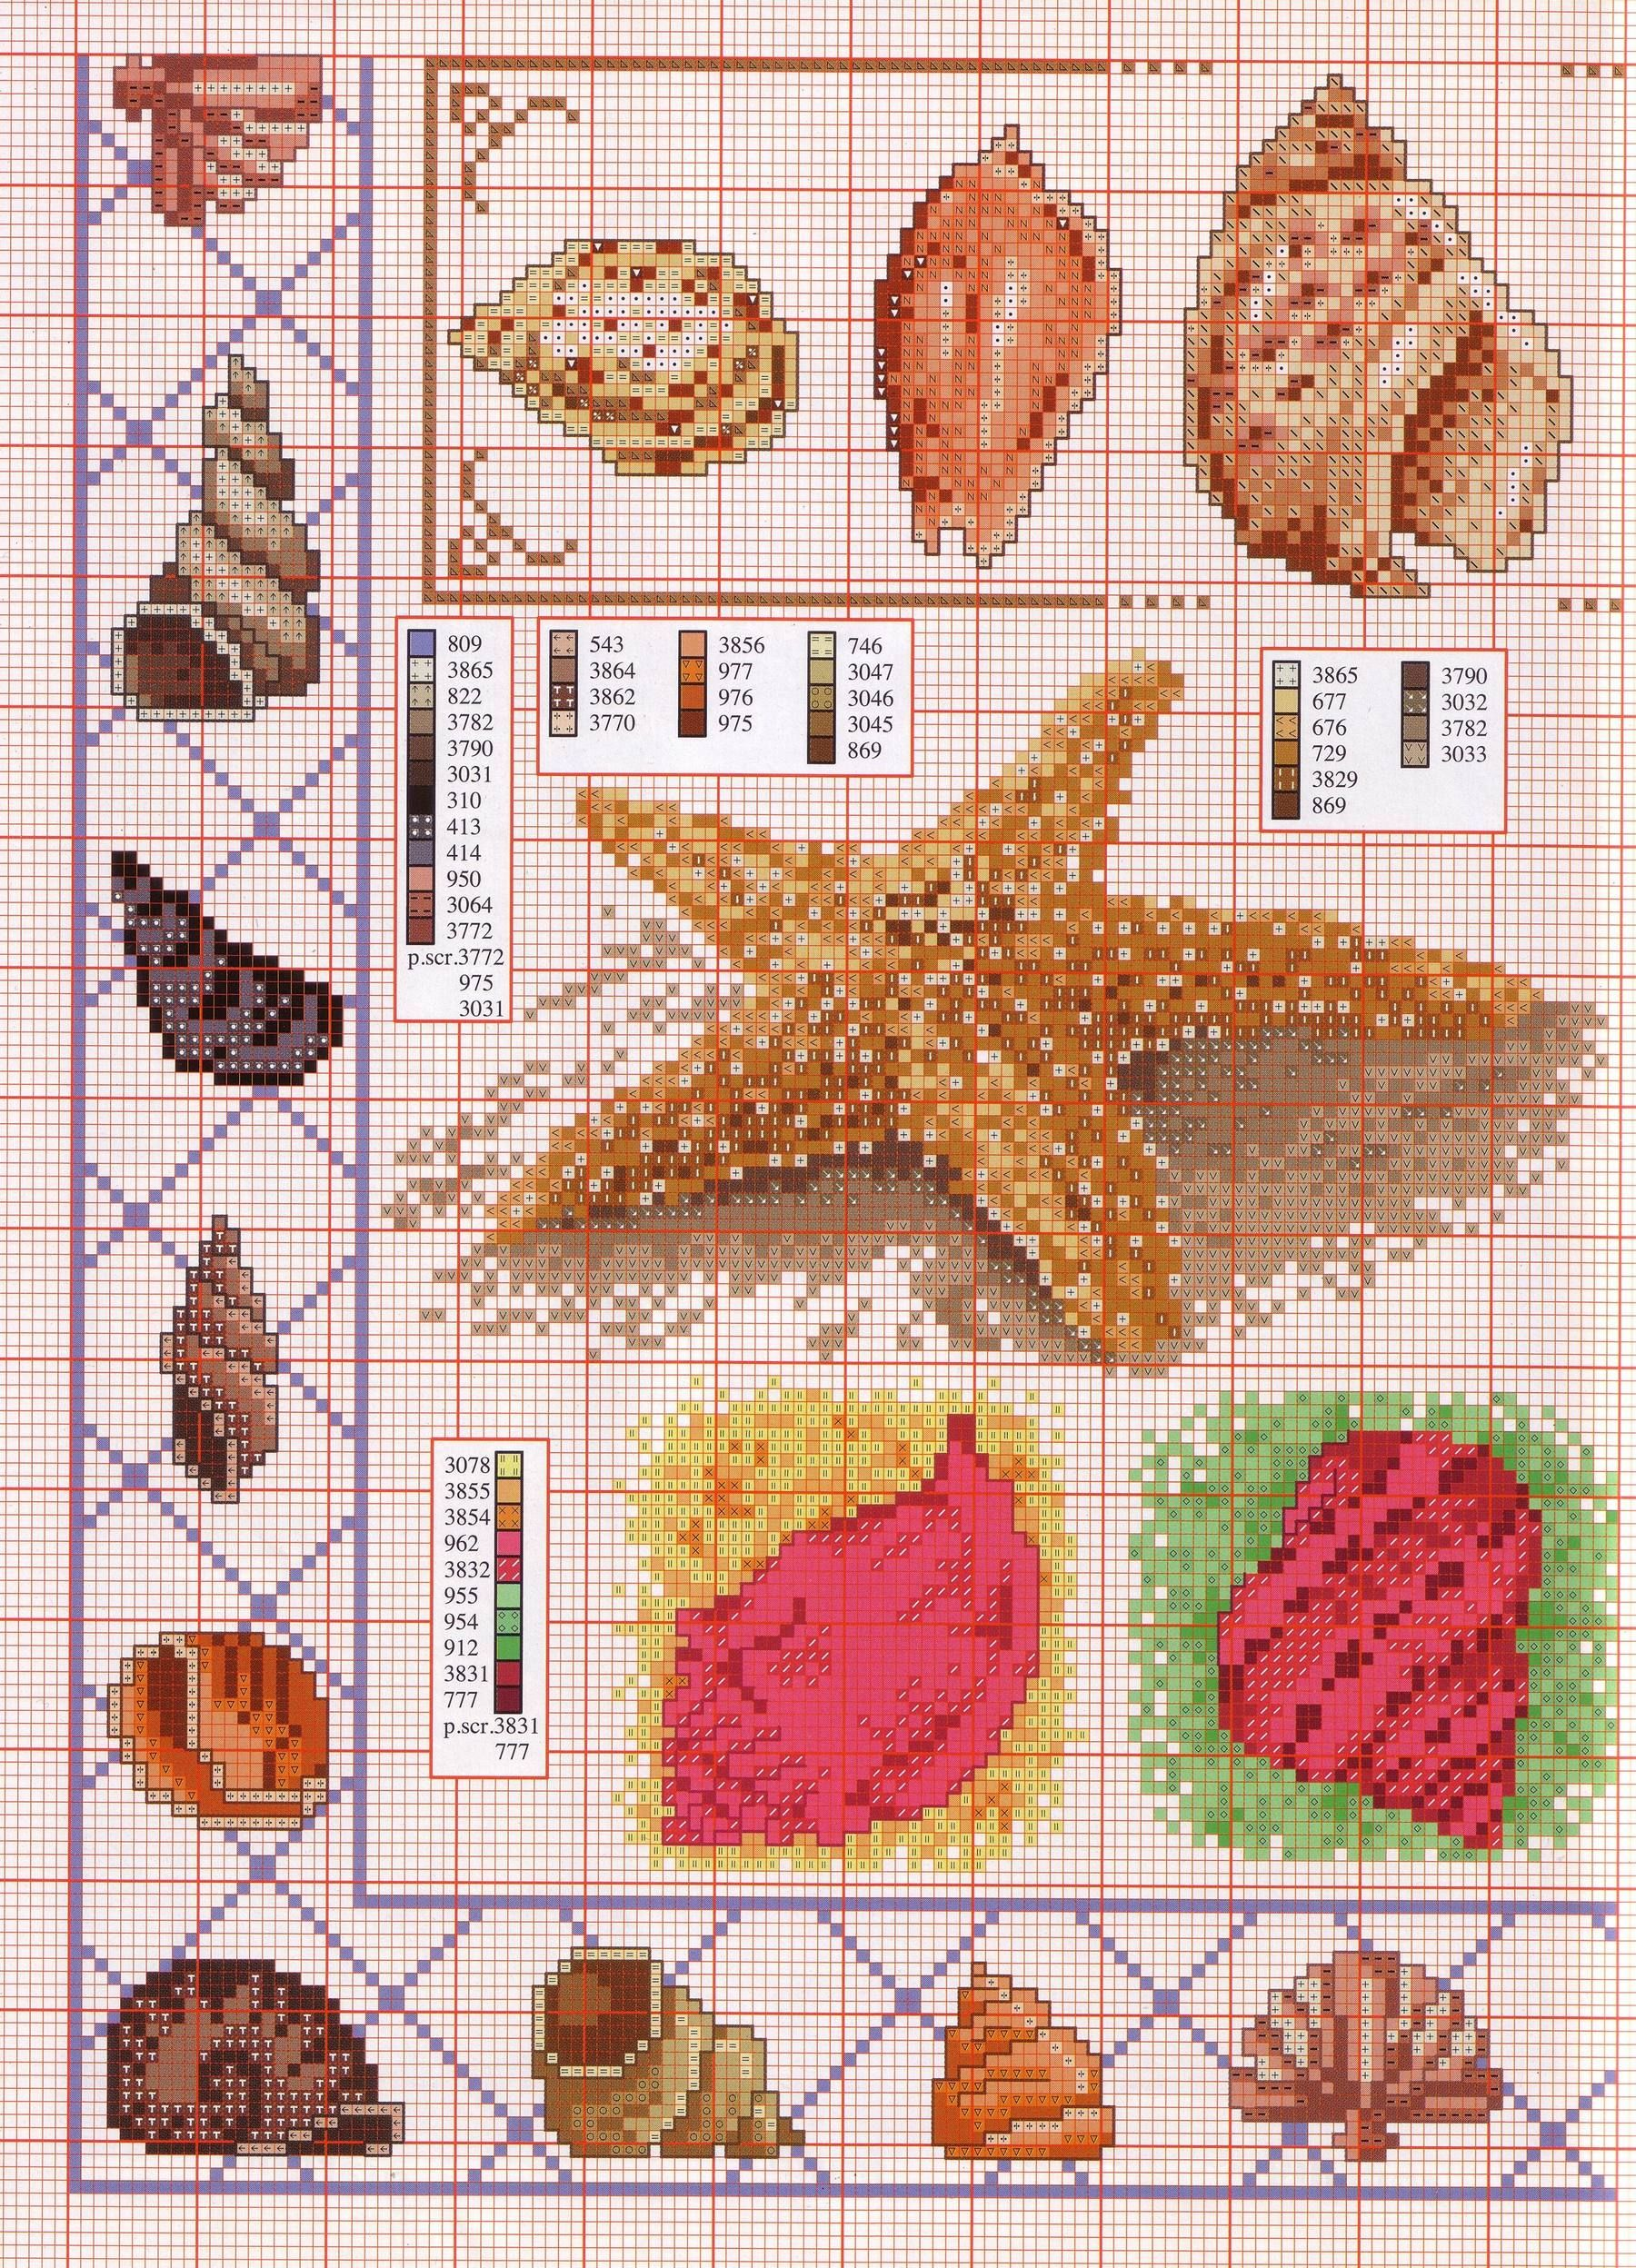 Sea DIY Cross Stitch Pattern Nature Digital Realistic Starfish Starfish